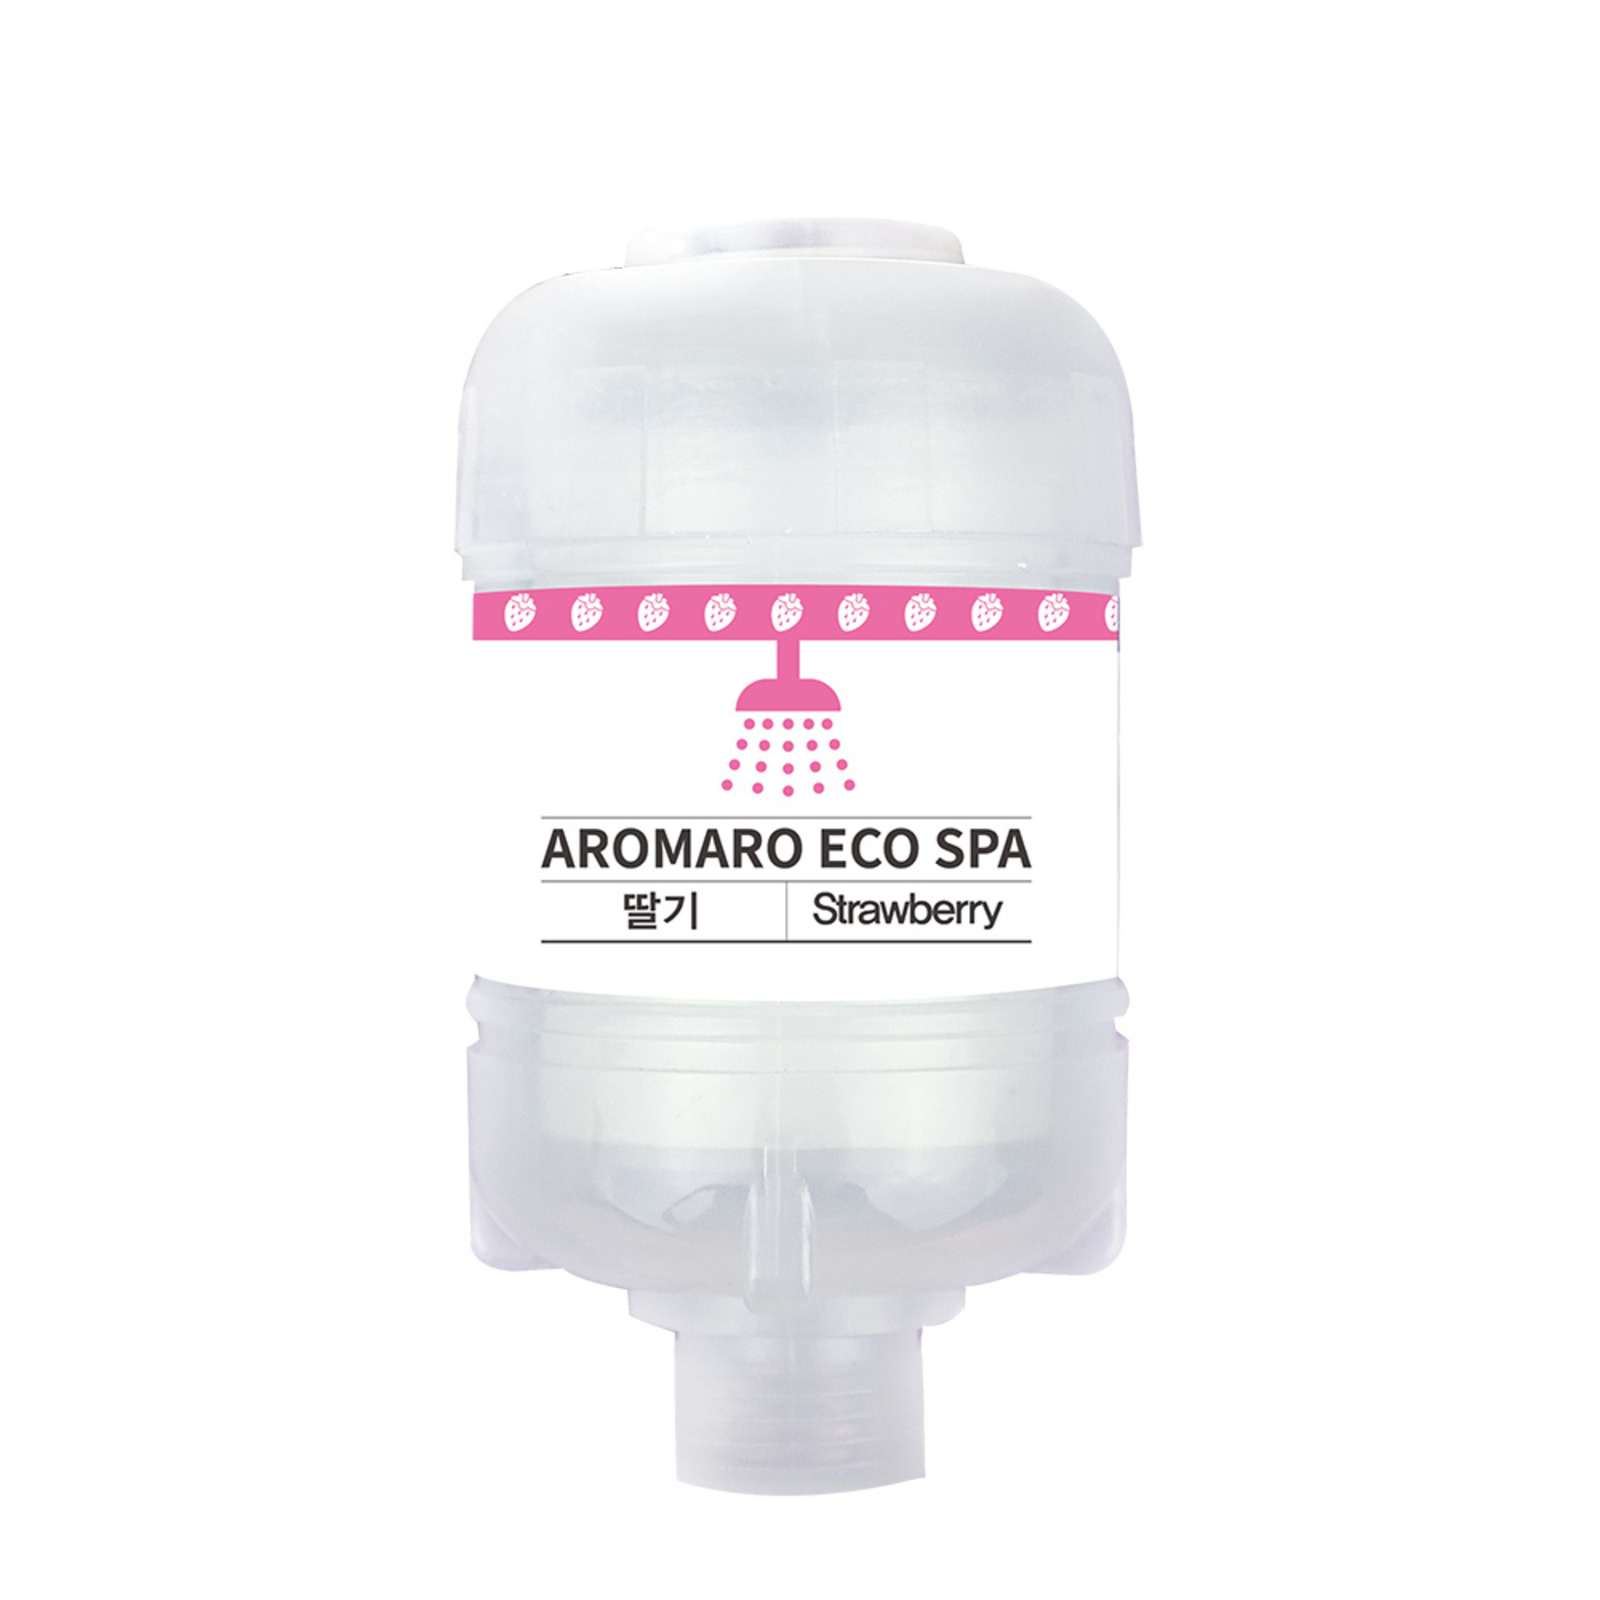 Aromaro Eco Spa Shower Filter - Strawberry